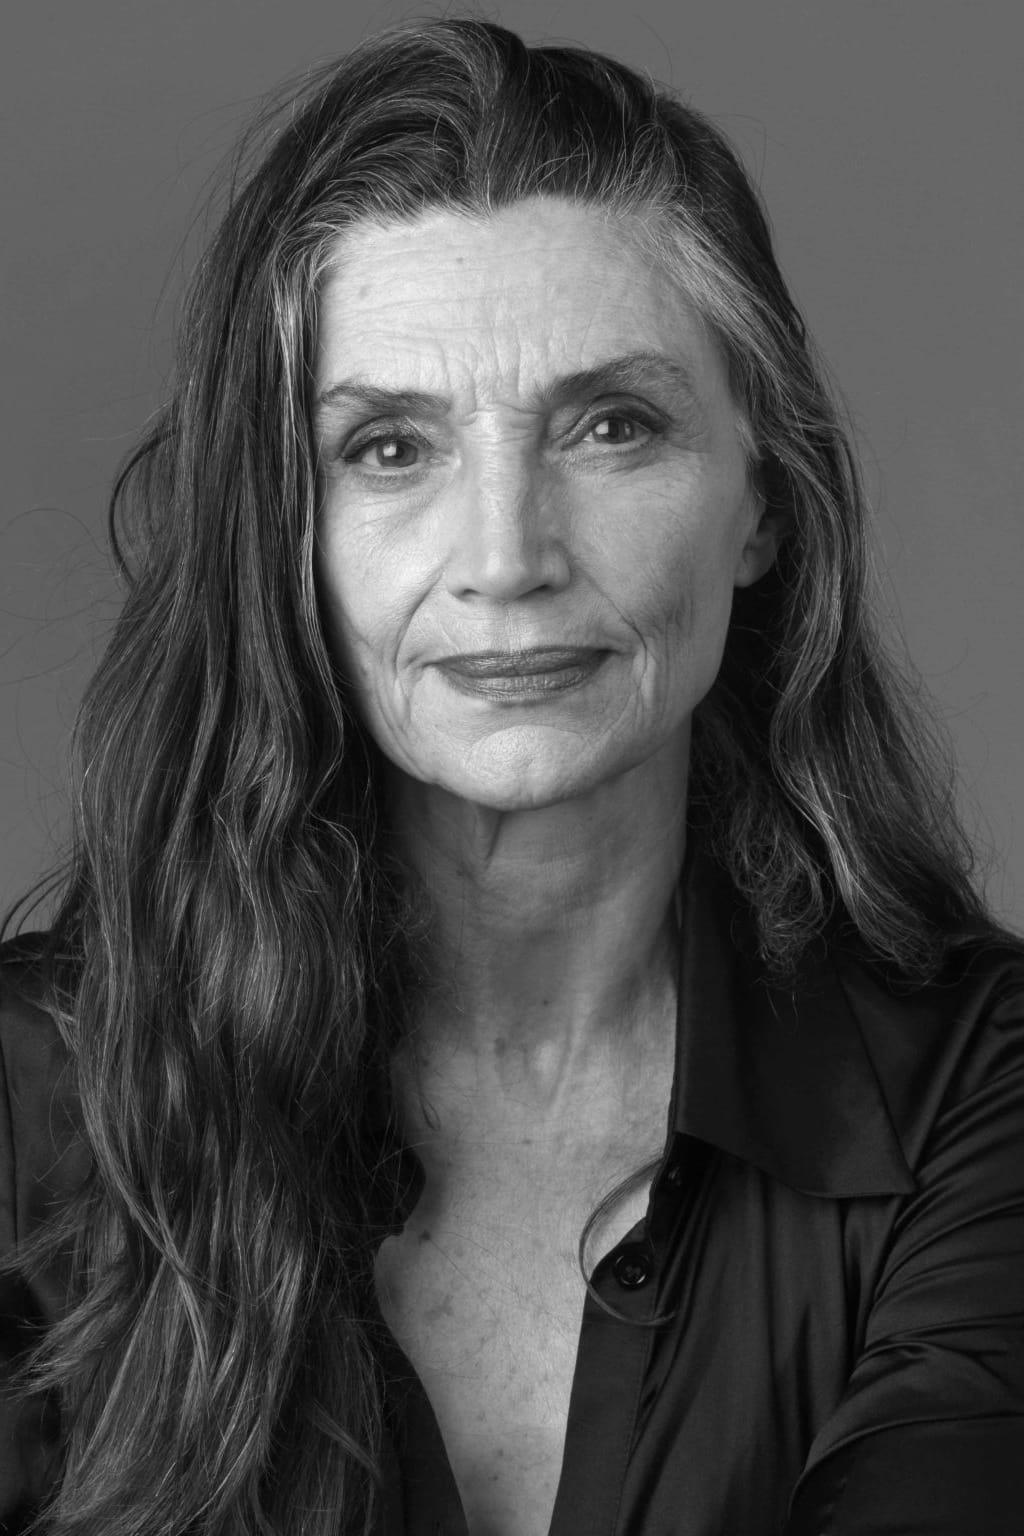 Ángela Molina, Goya de Honor en 2021